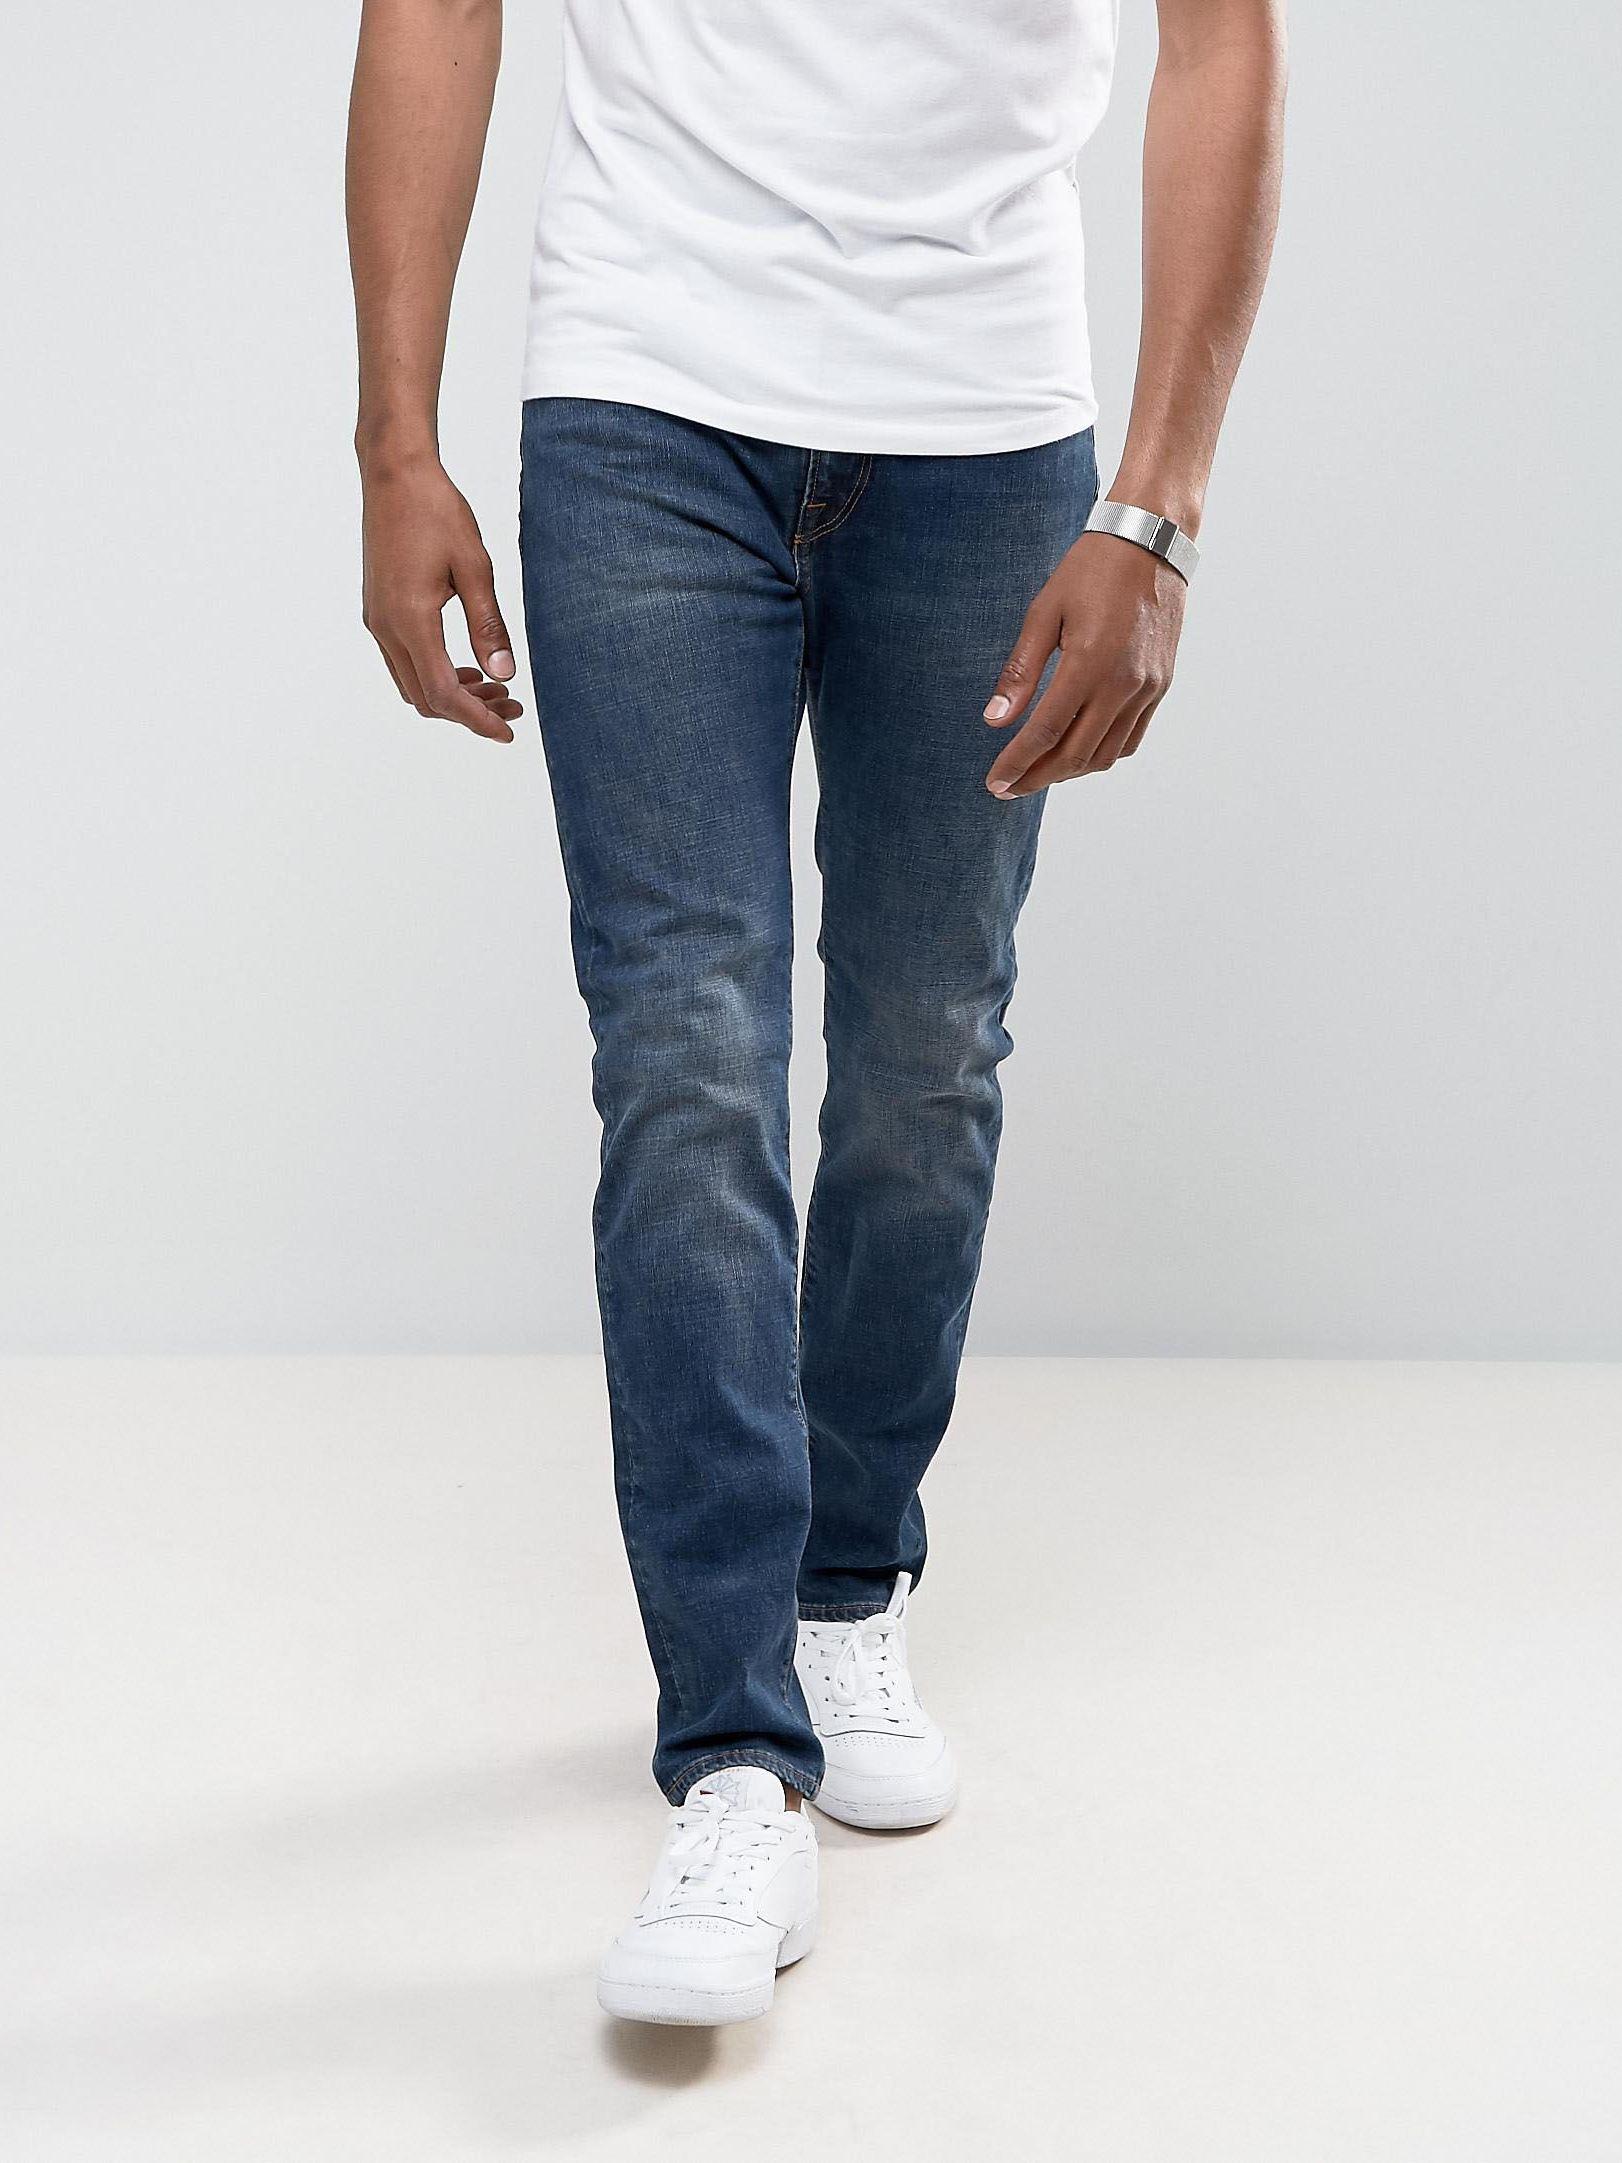 Джинсы Paul Smith VY/210520-3 Синий Free Style